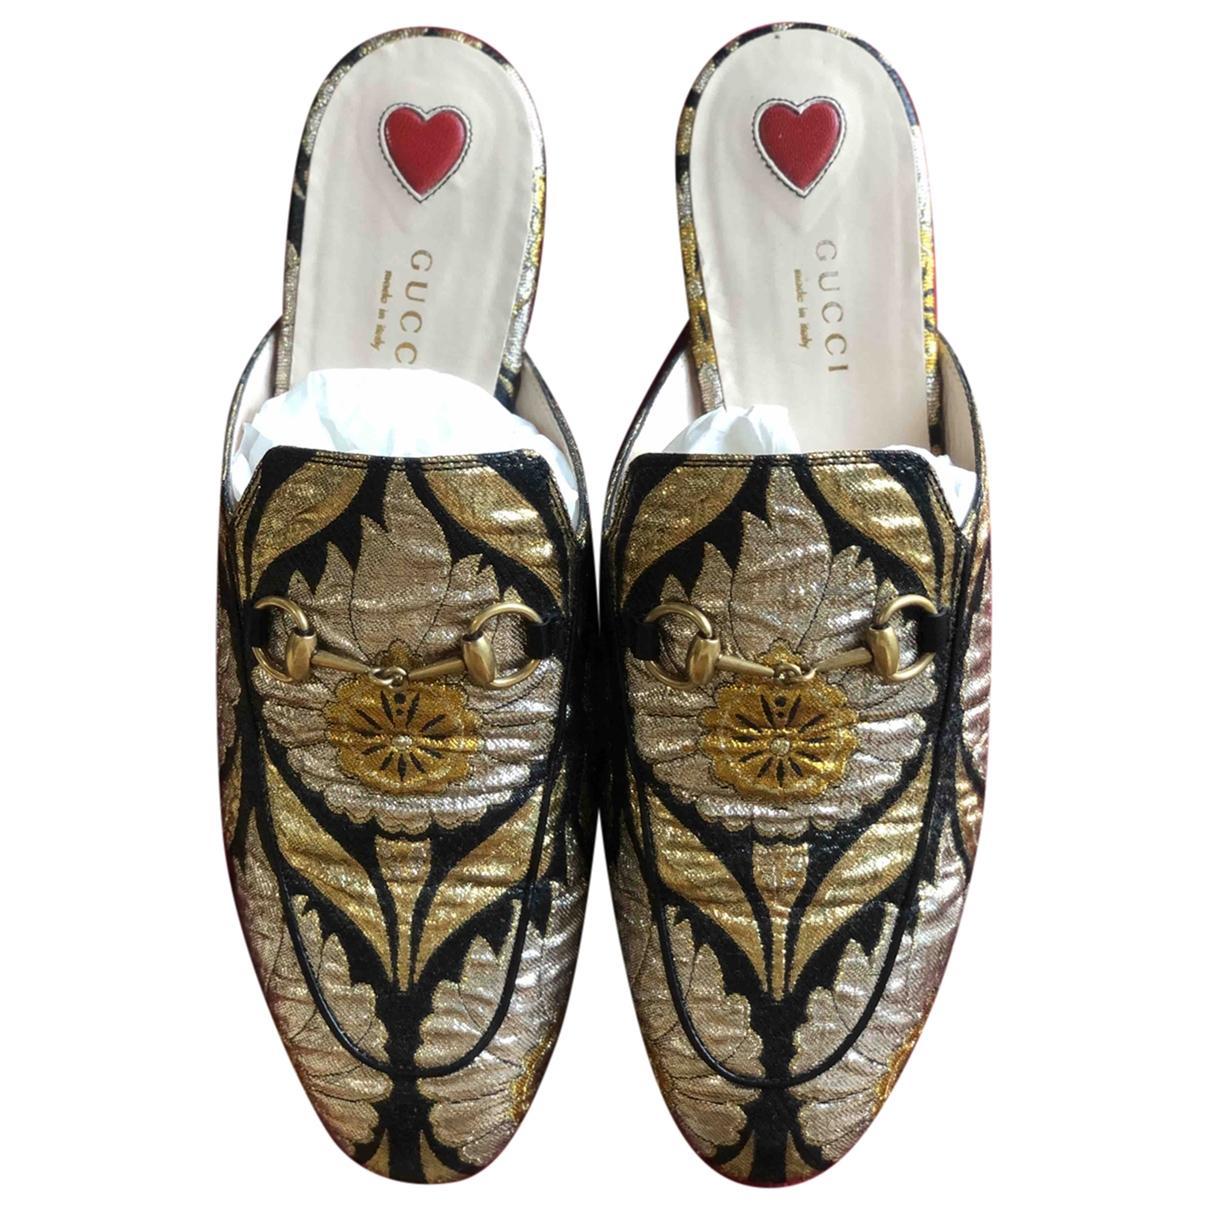 Gucci Princetown Gold Cloth Flats for Women 38.5 EU